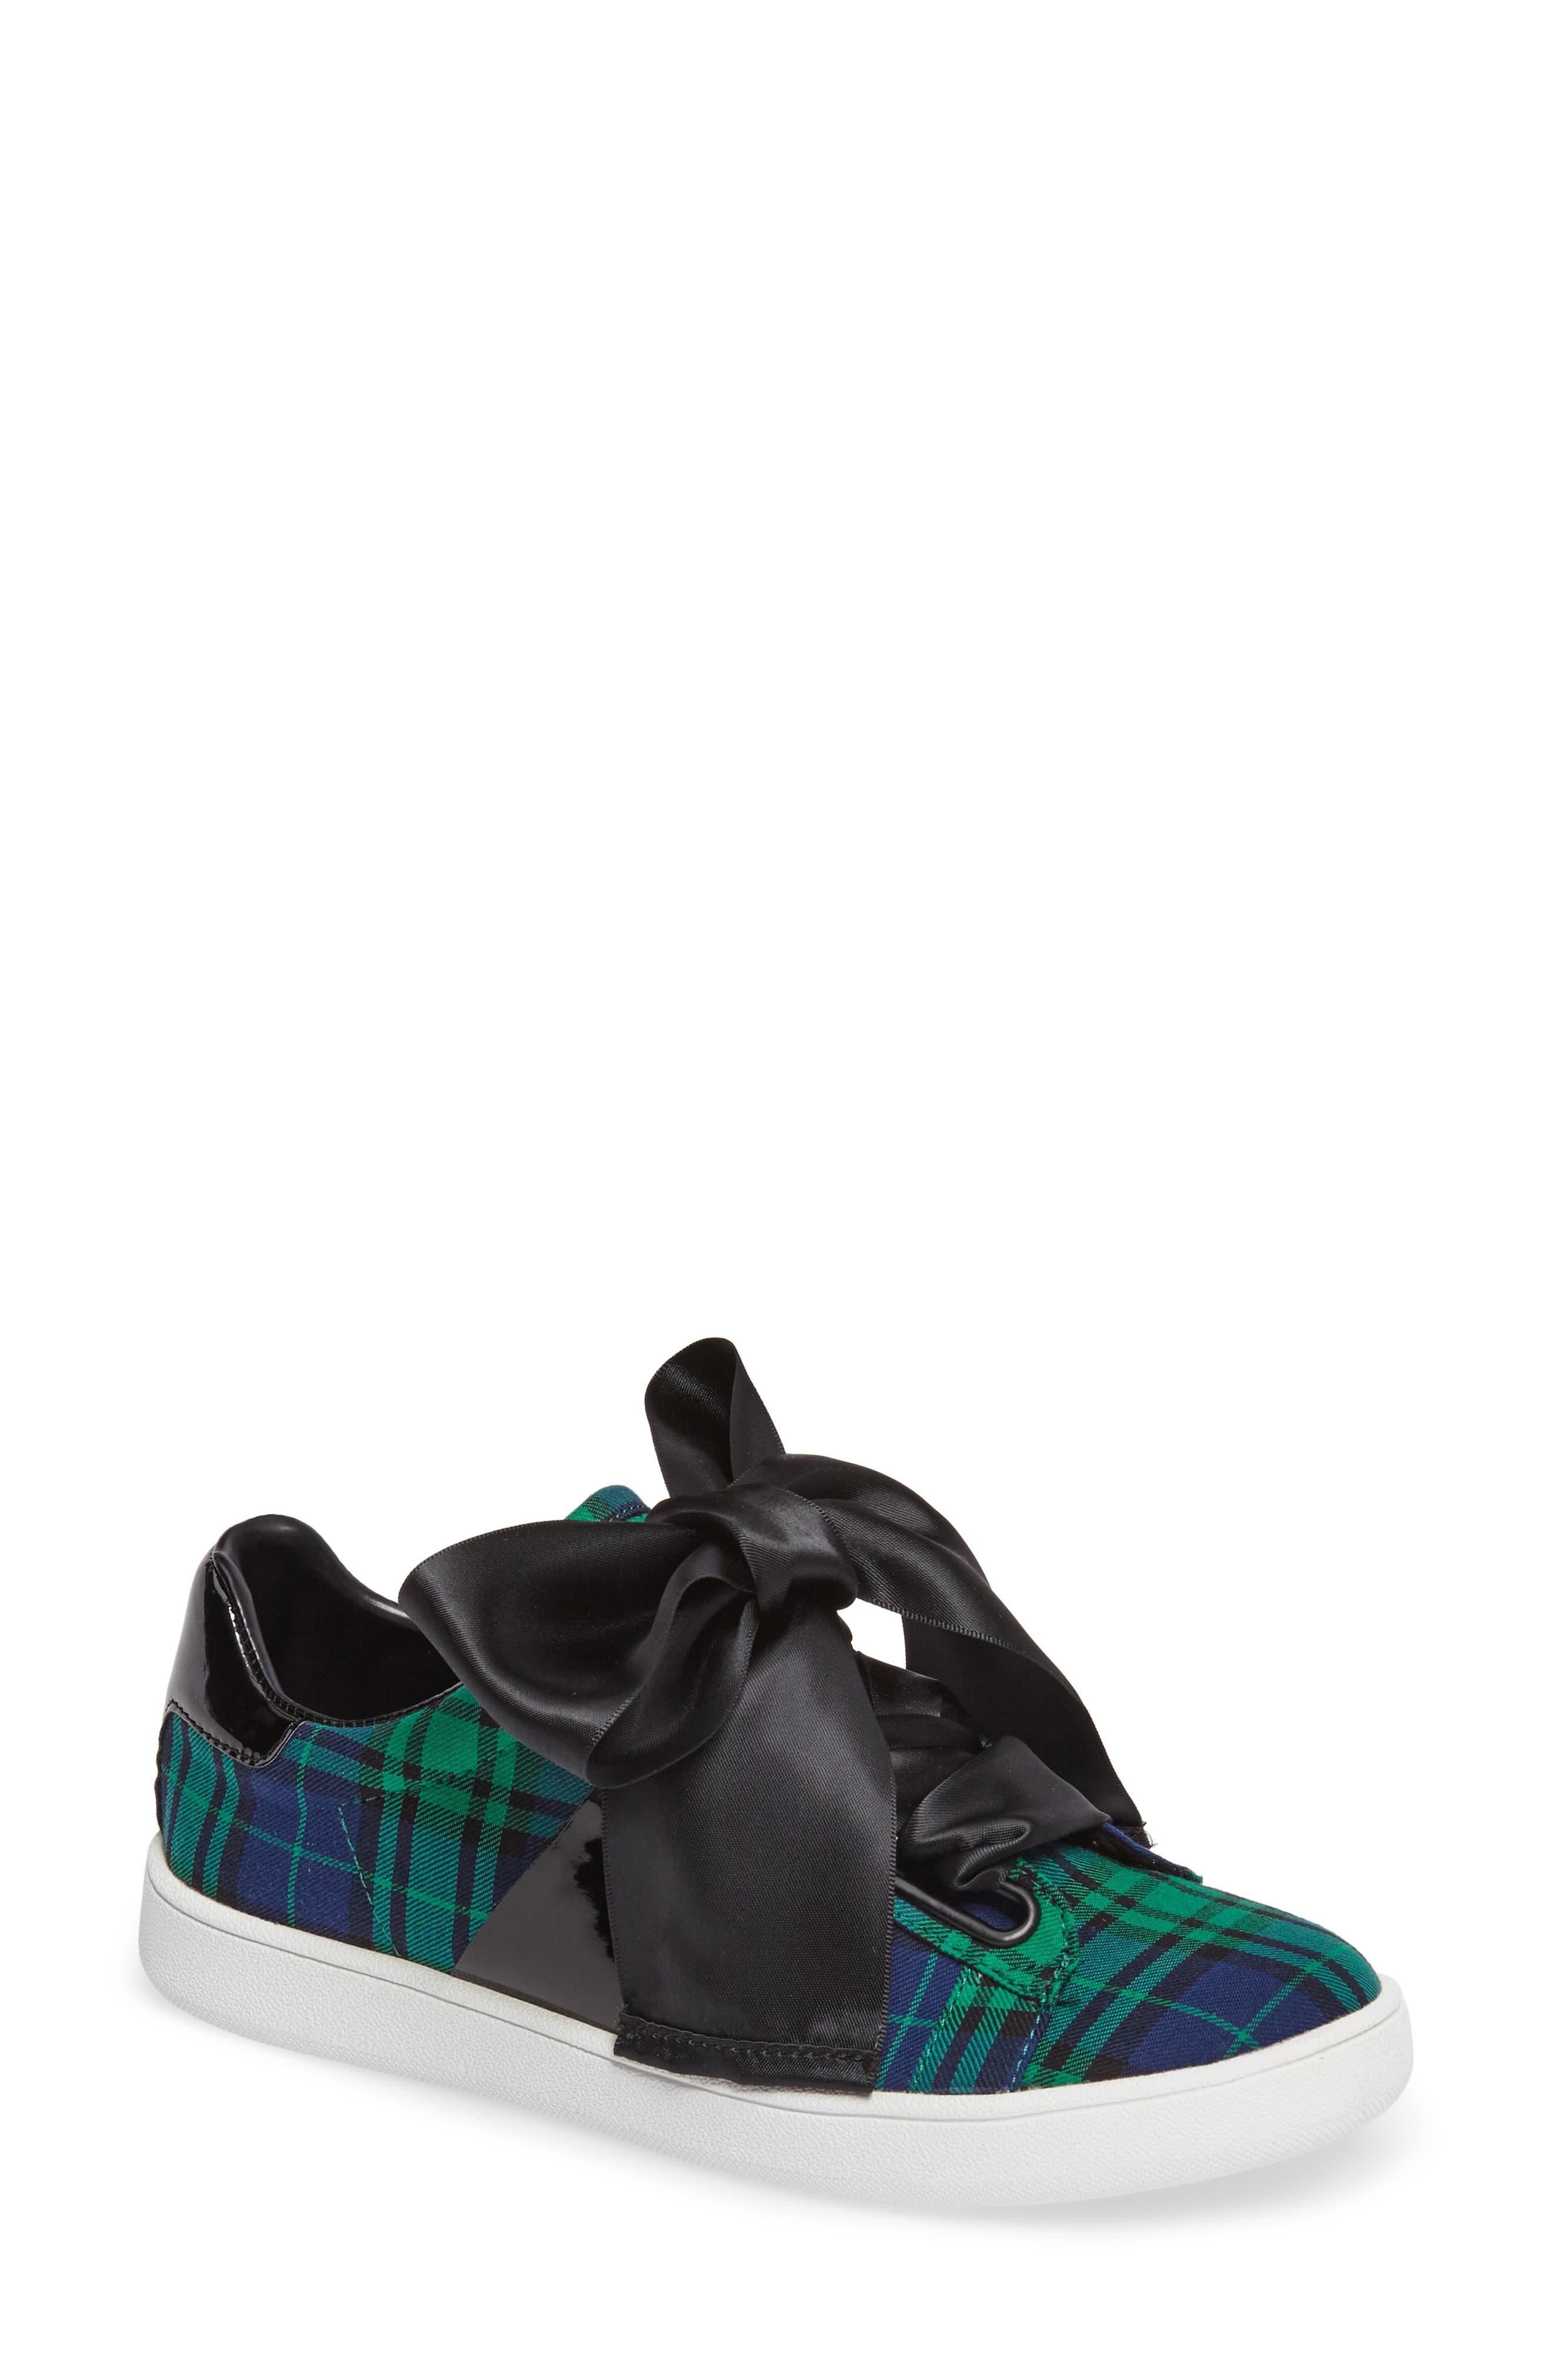 Pabst Low-Top Sneaker,                             Main thumbnail 5, color,